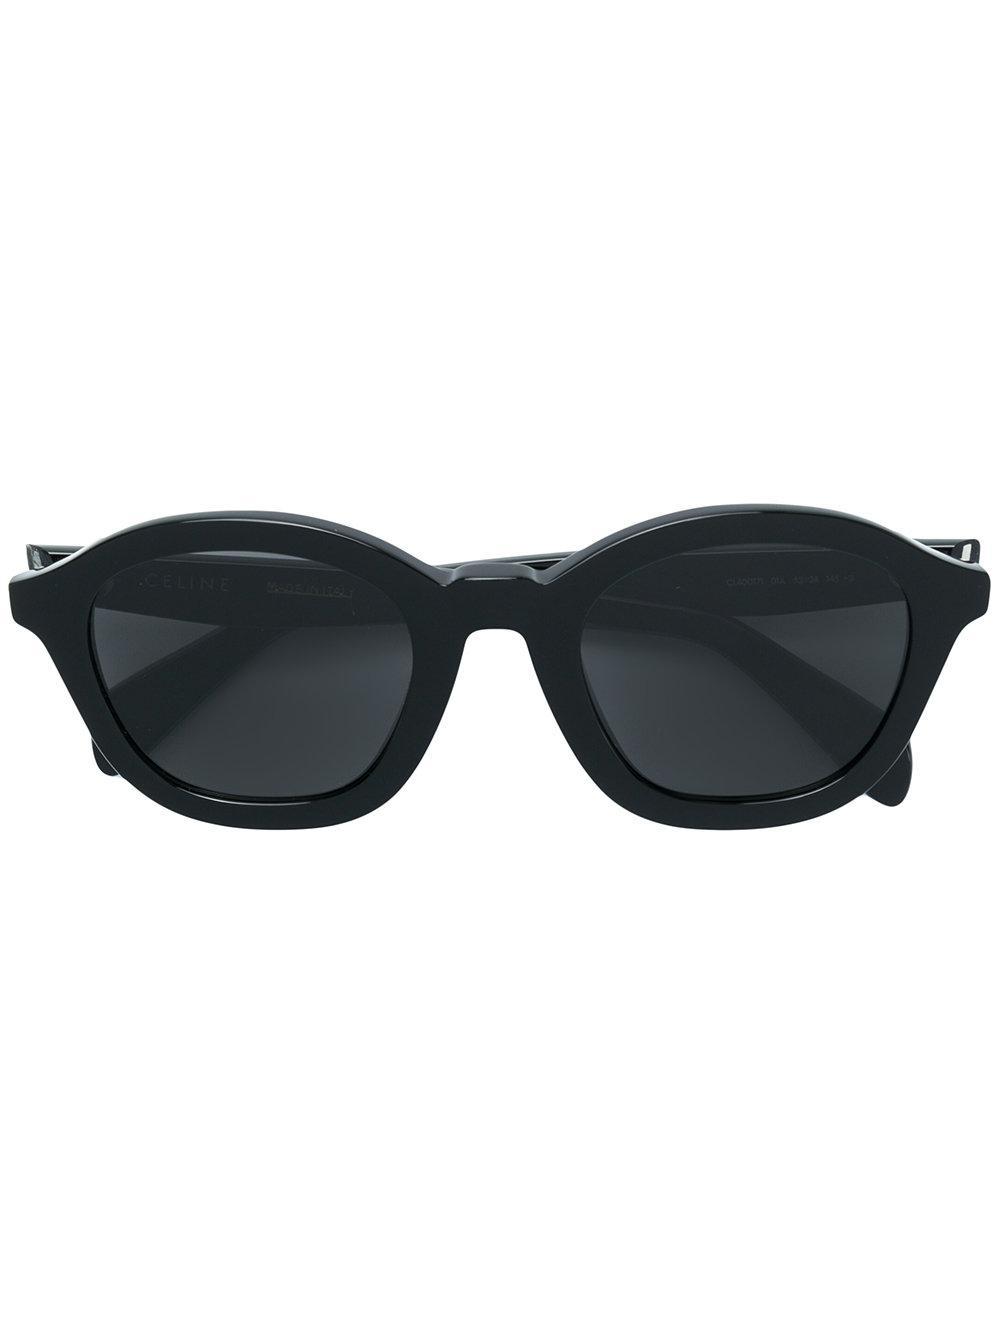 Celine Eyewear Round Sunglasses - Black